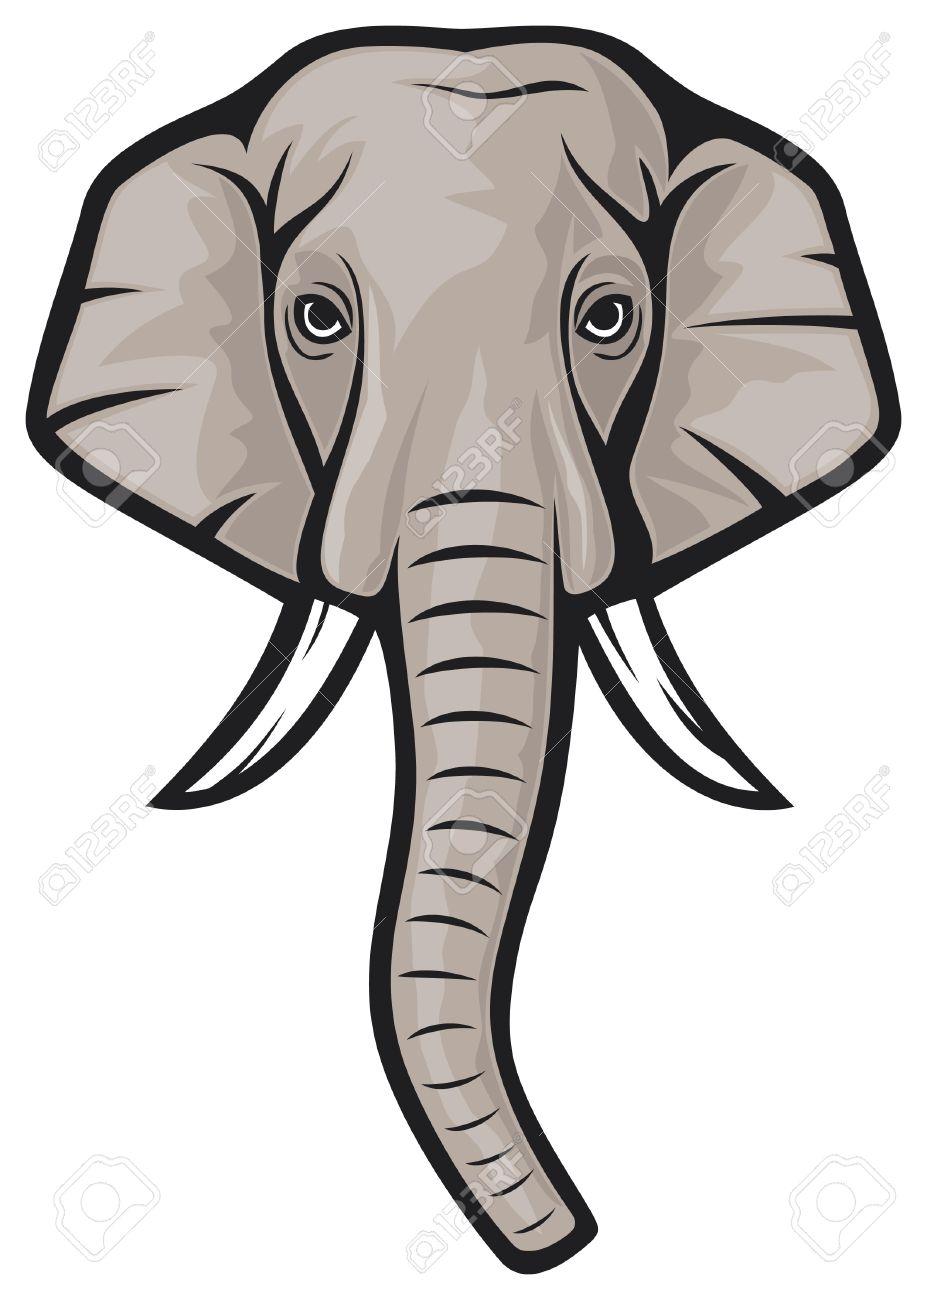 Elephant Head Clipart & Elephant Head Clip Art Images.